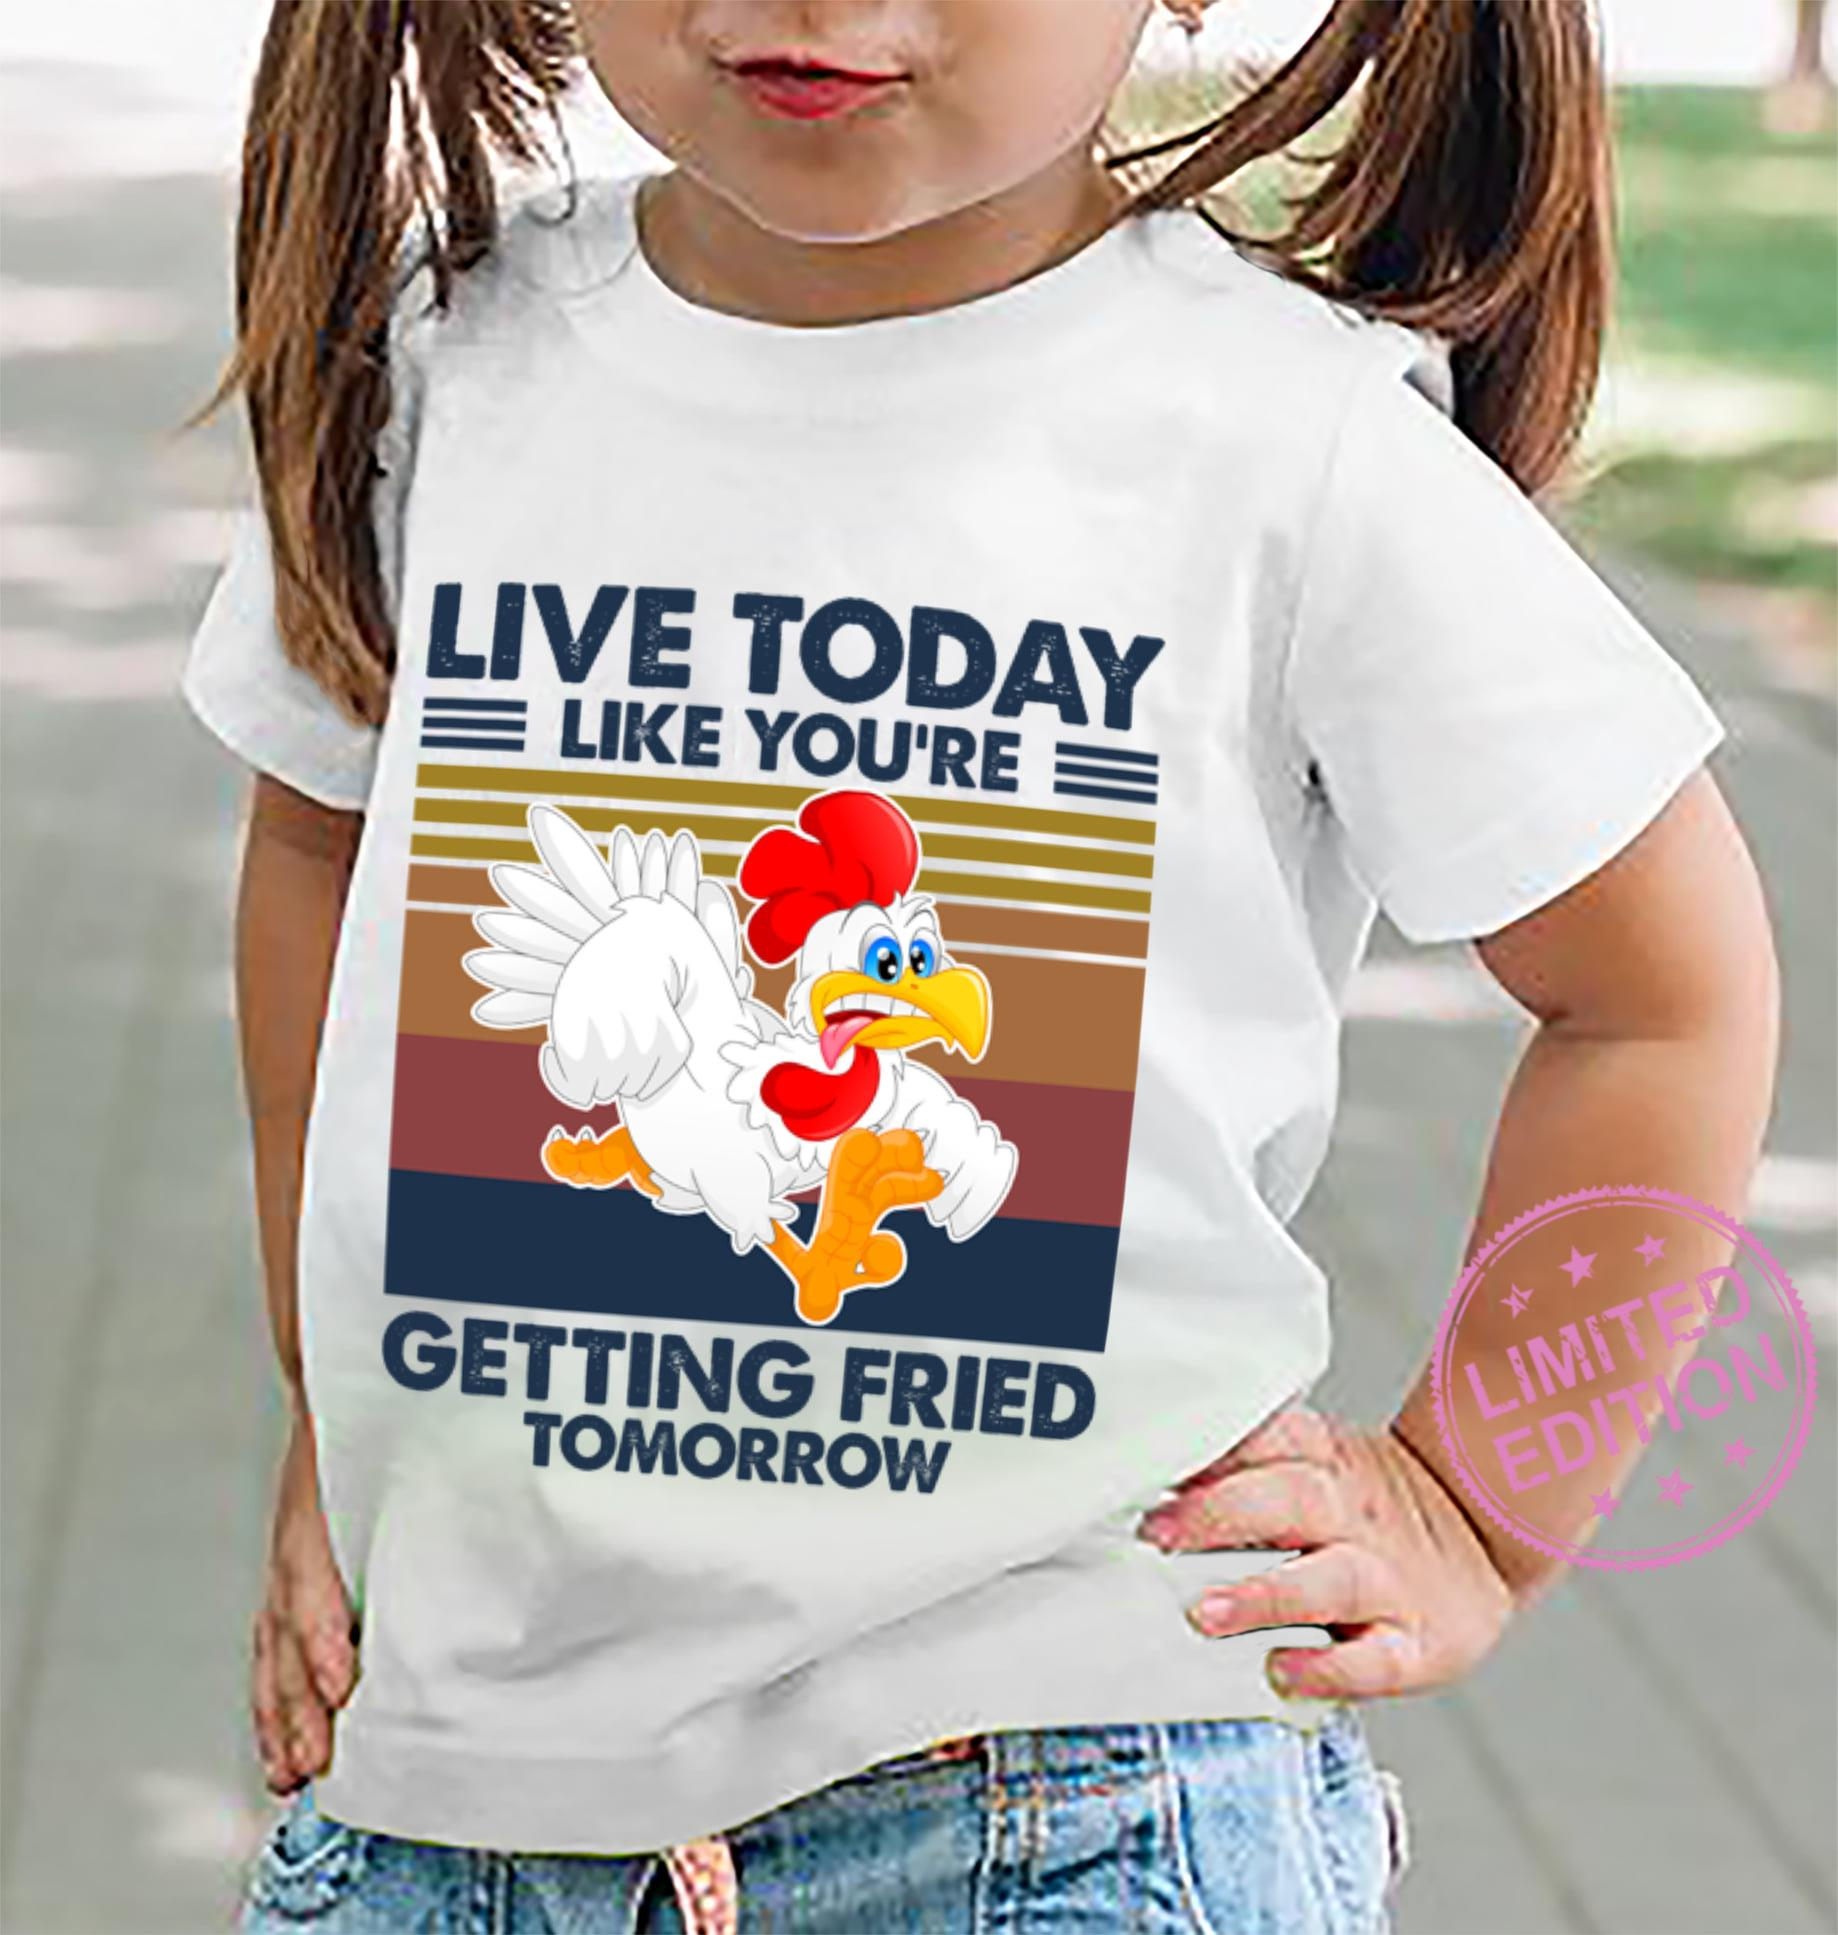 Live today like you're getting fried tomorrow shirt